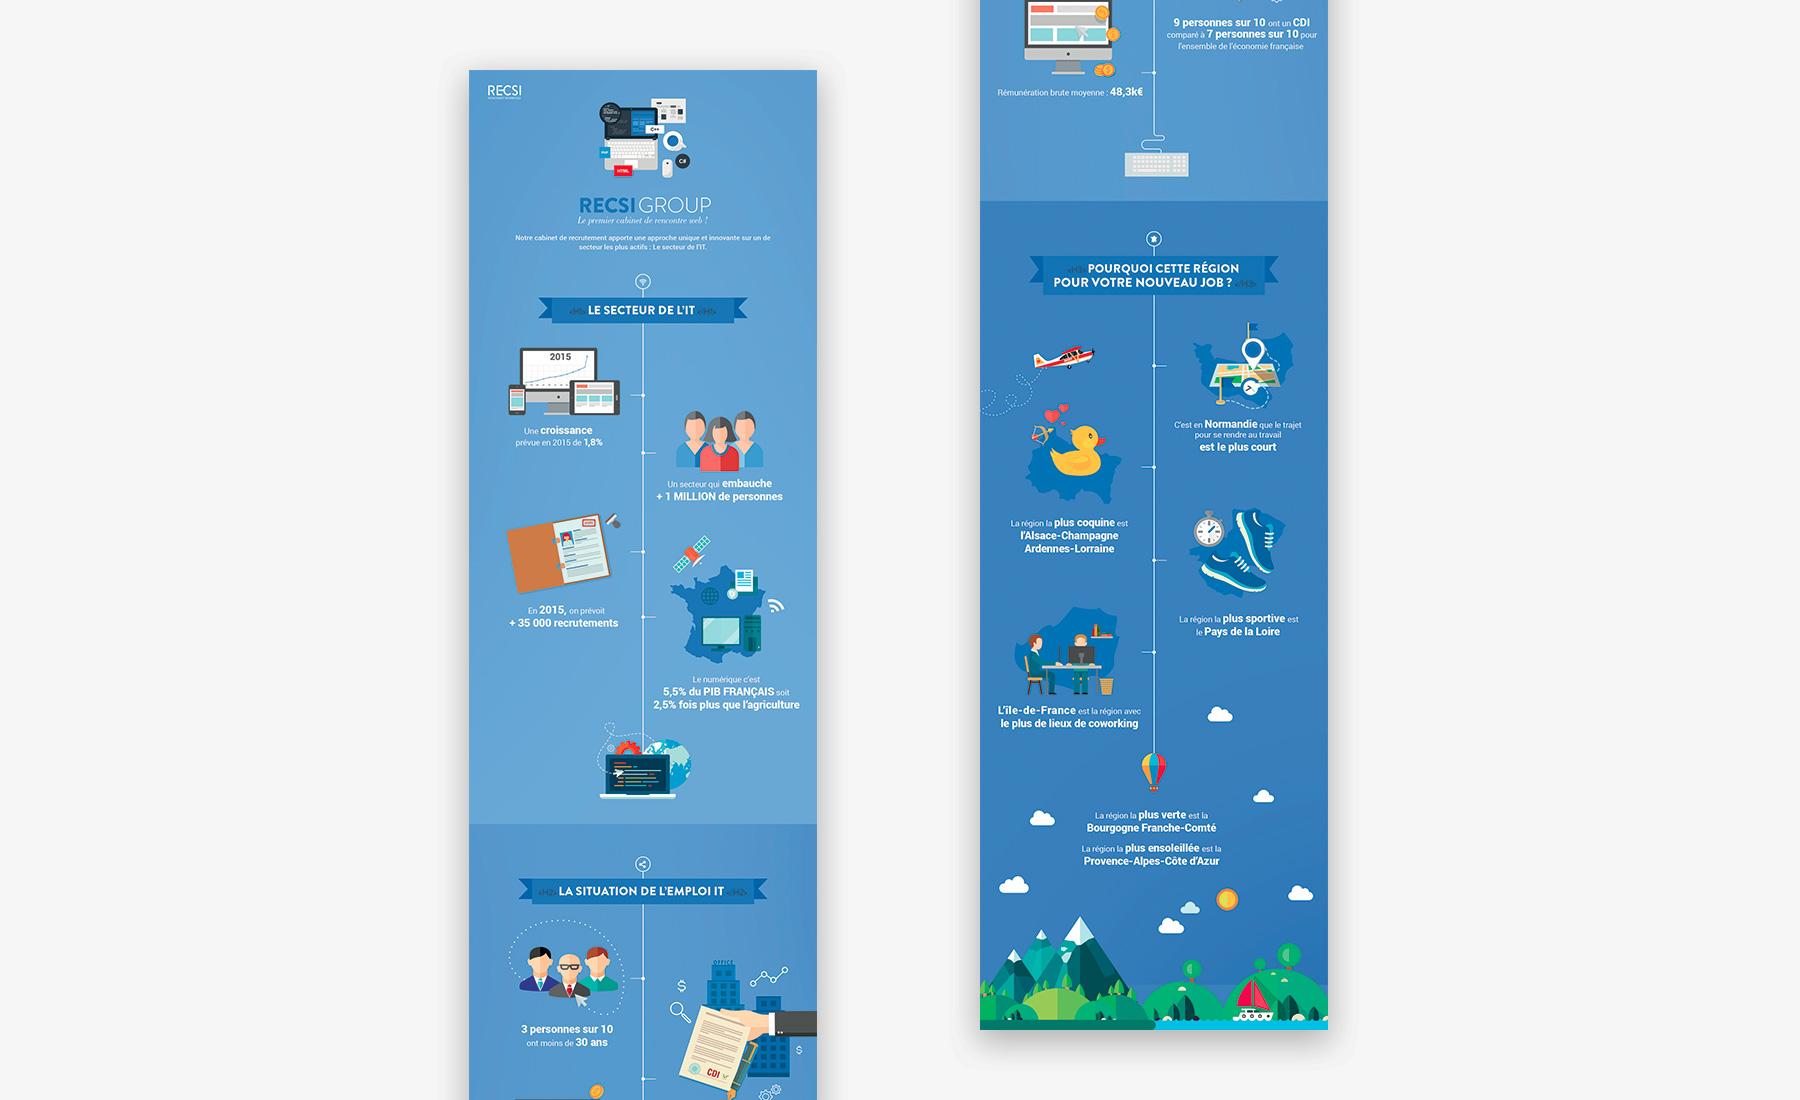 Recsi - Création plateforme de recrutement - agence Sharing